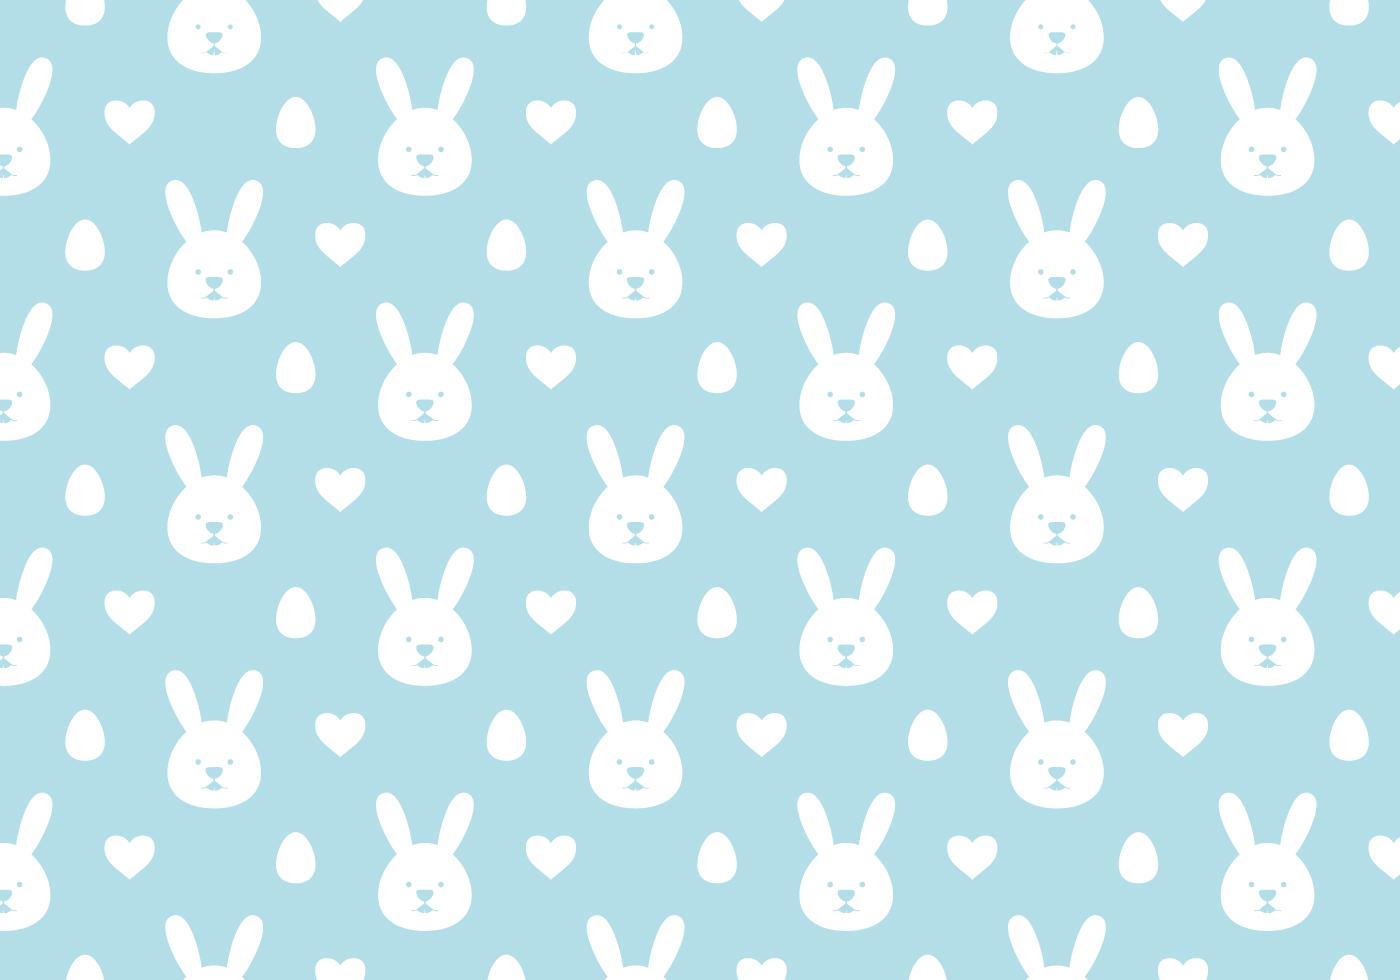 Easter Bunny Wallpaper Background Download Free Vectors Clipart